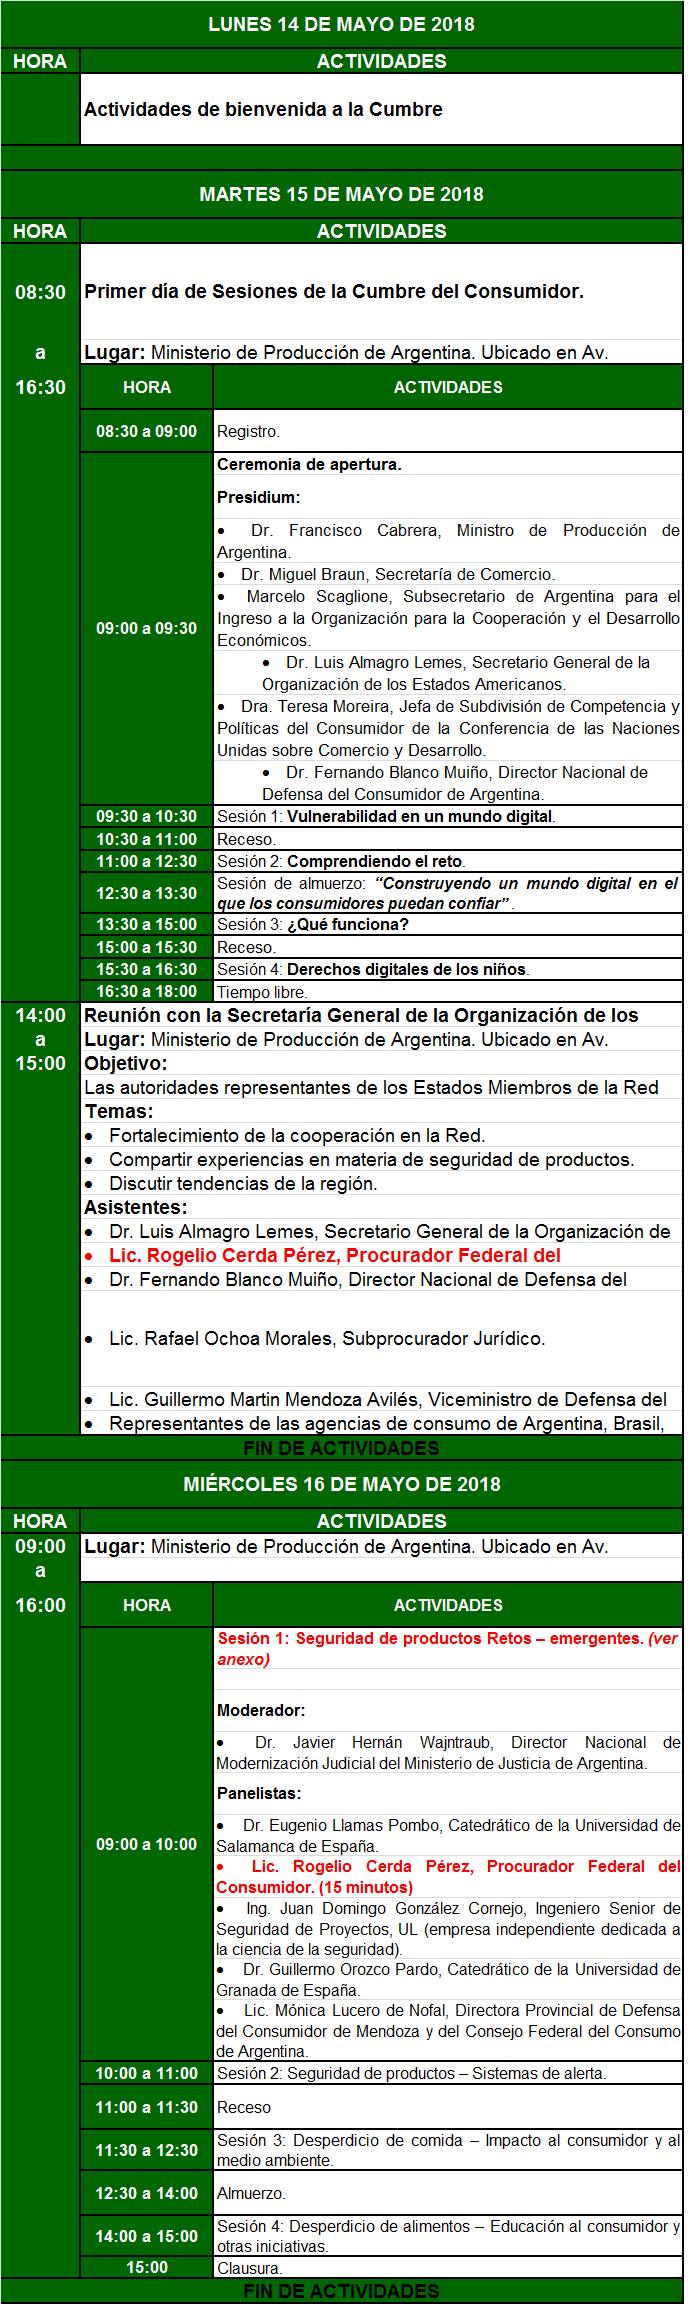 /cms/uploads/image/file/401444/tabla_de_actividades.png